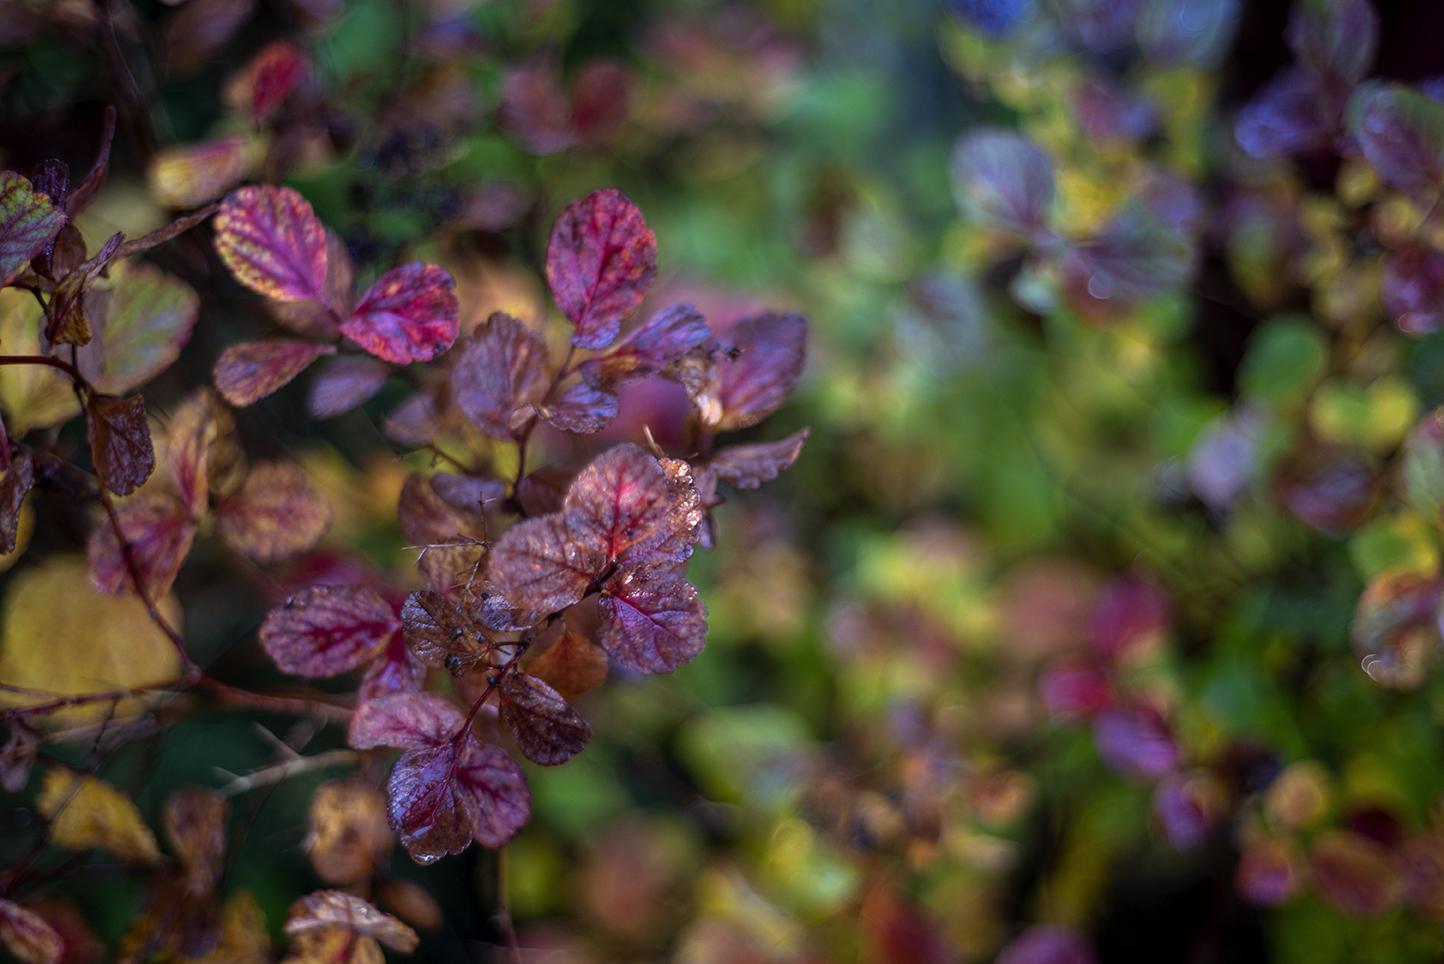 Buske med blad i lila höstfärger.